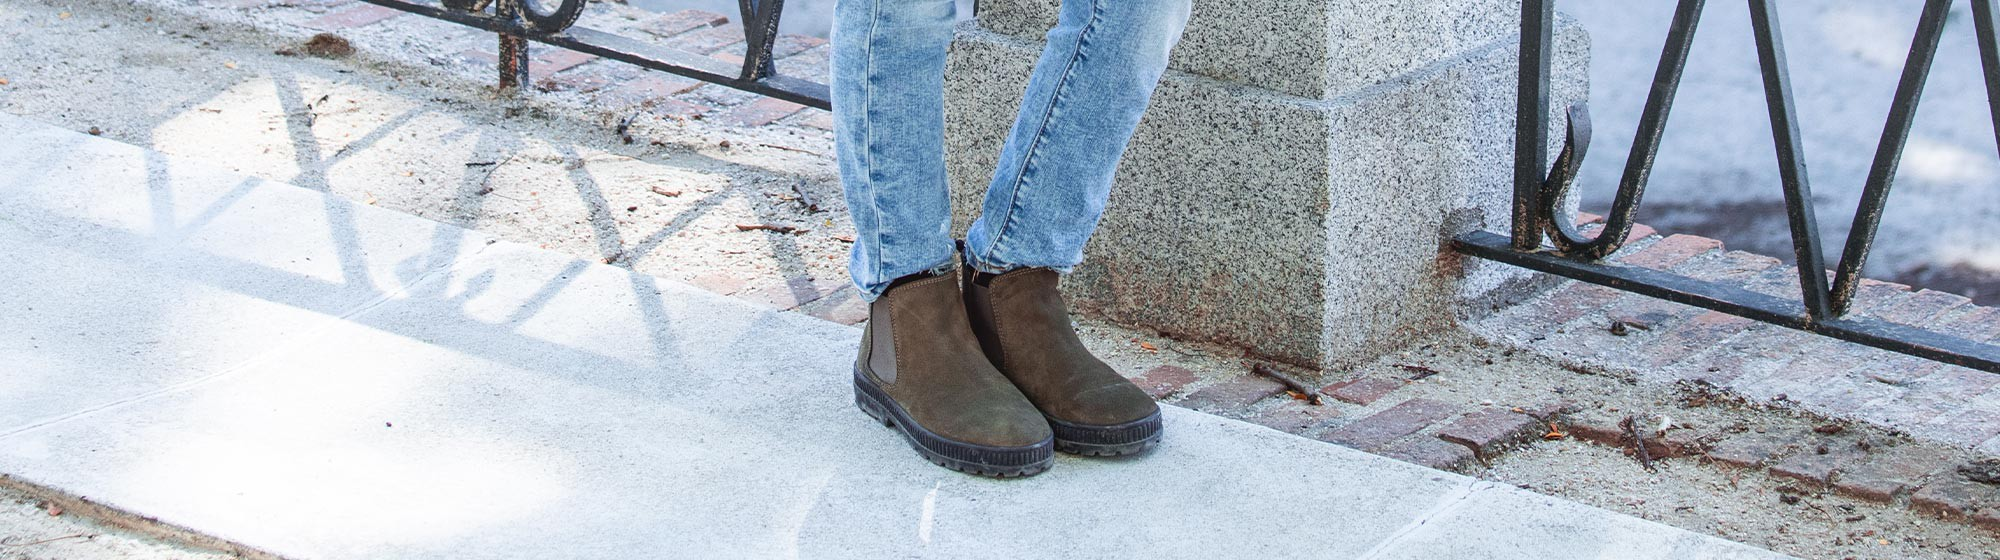 Chaussures Montantes et Bottines